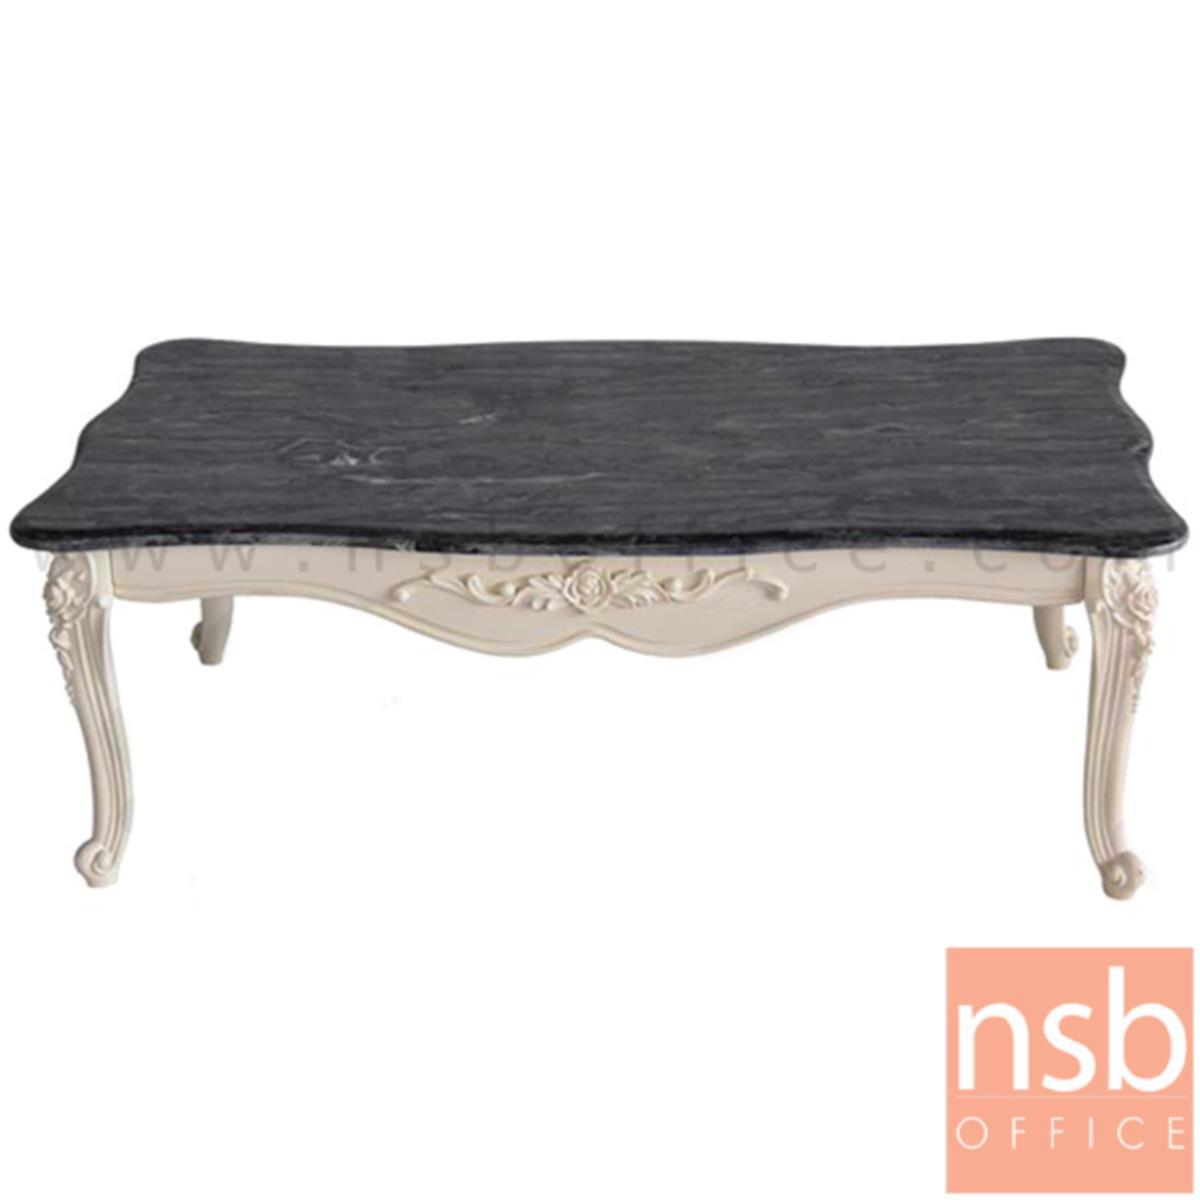 B13A216:โต๊ะกลางหินอ่อน  รุ่น AYUMI-01 ขนาด 120W cm. ขาสลักลาย